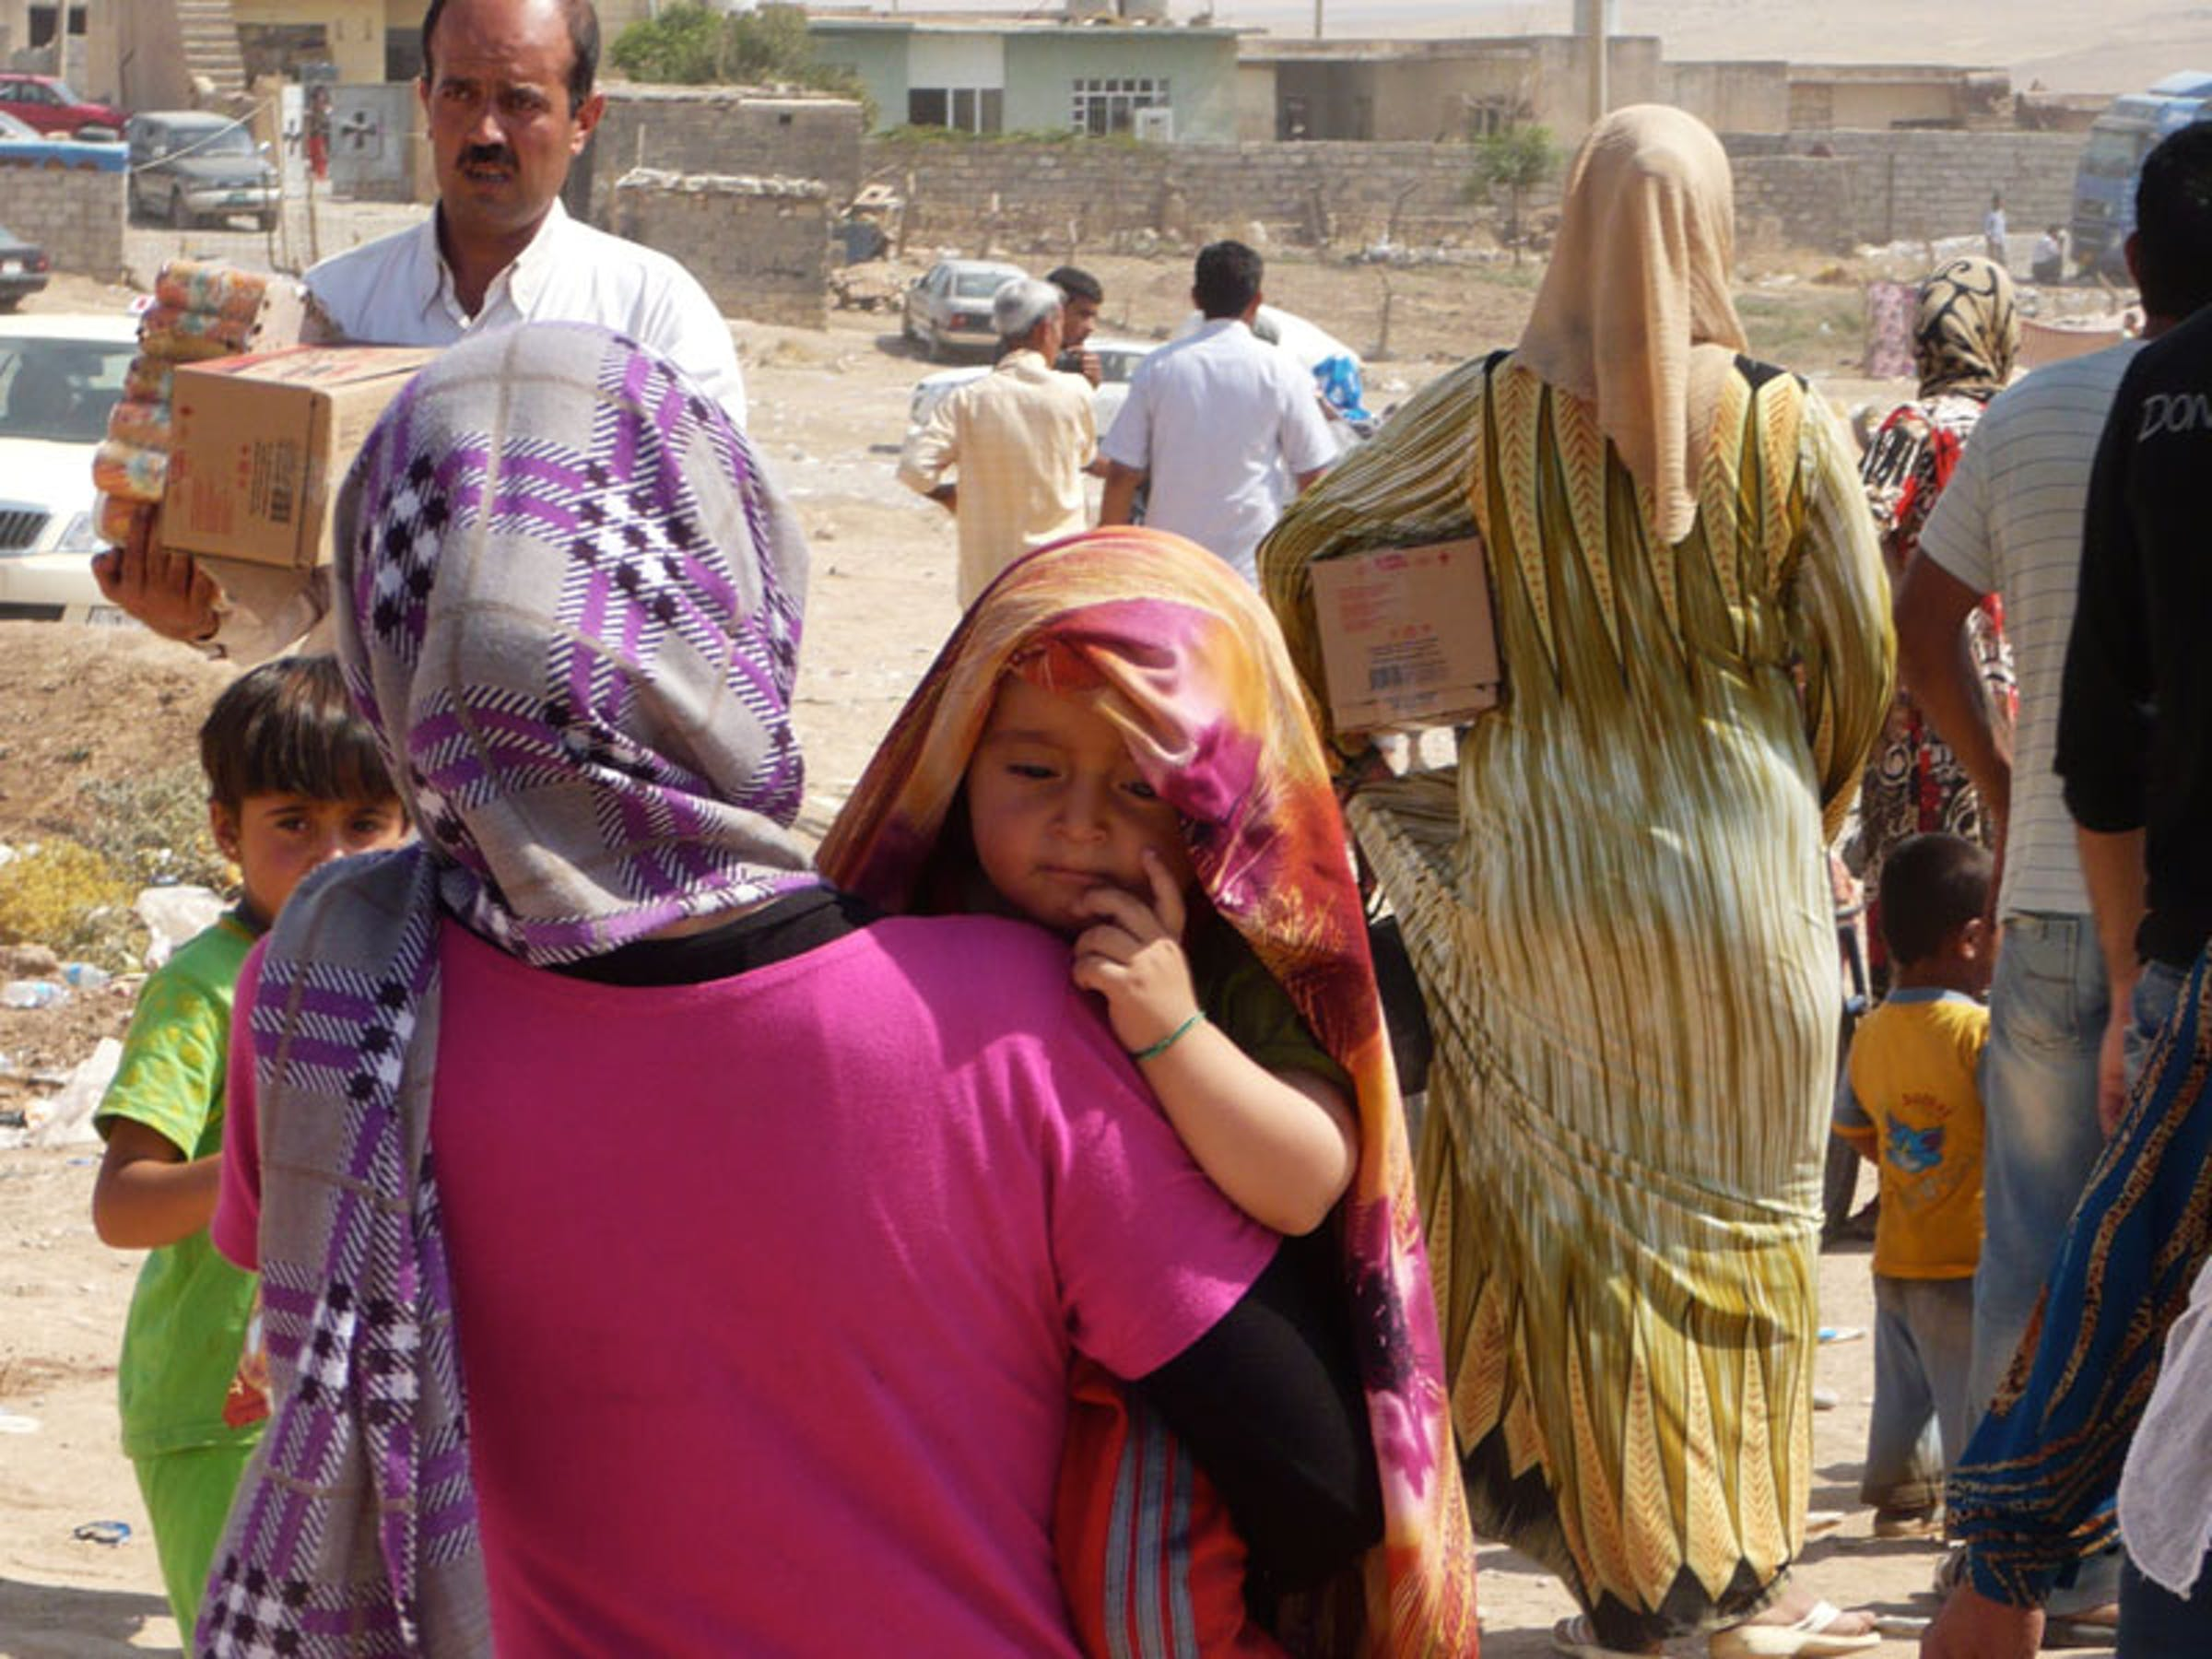 Profughi siriani a Dohuk (Iraq) - ©UNICEF Iraq/2013/Marshall Tuck